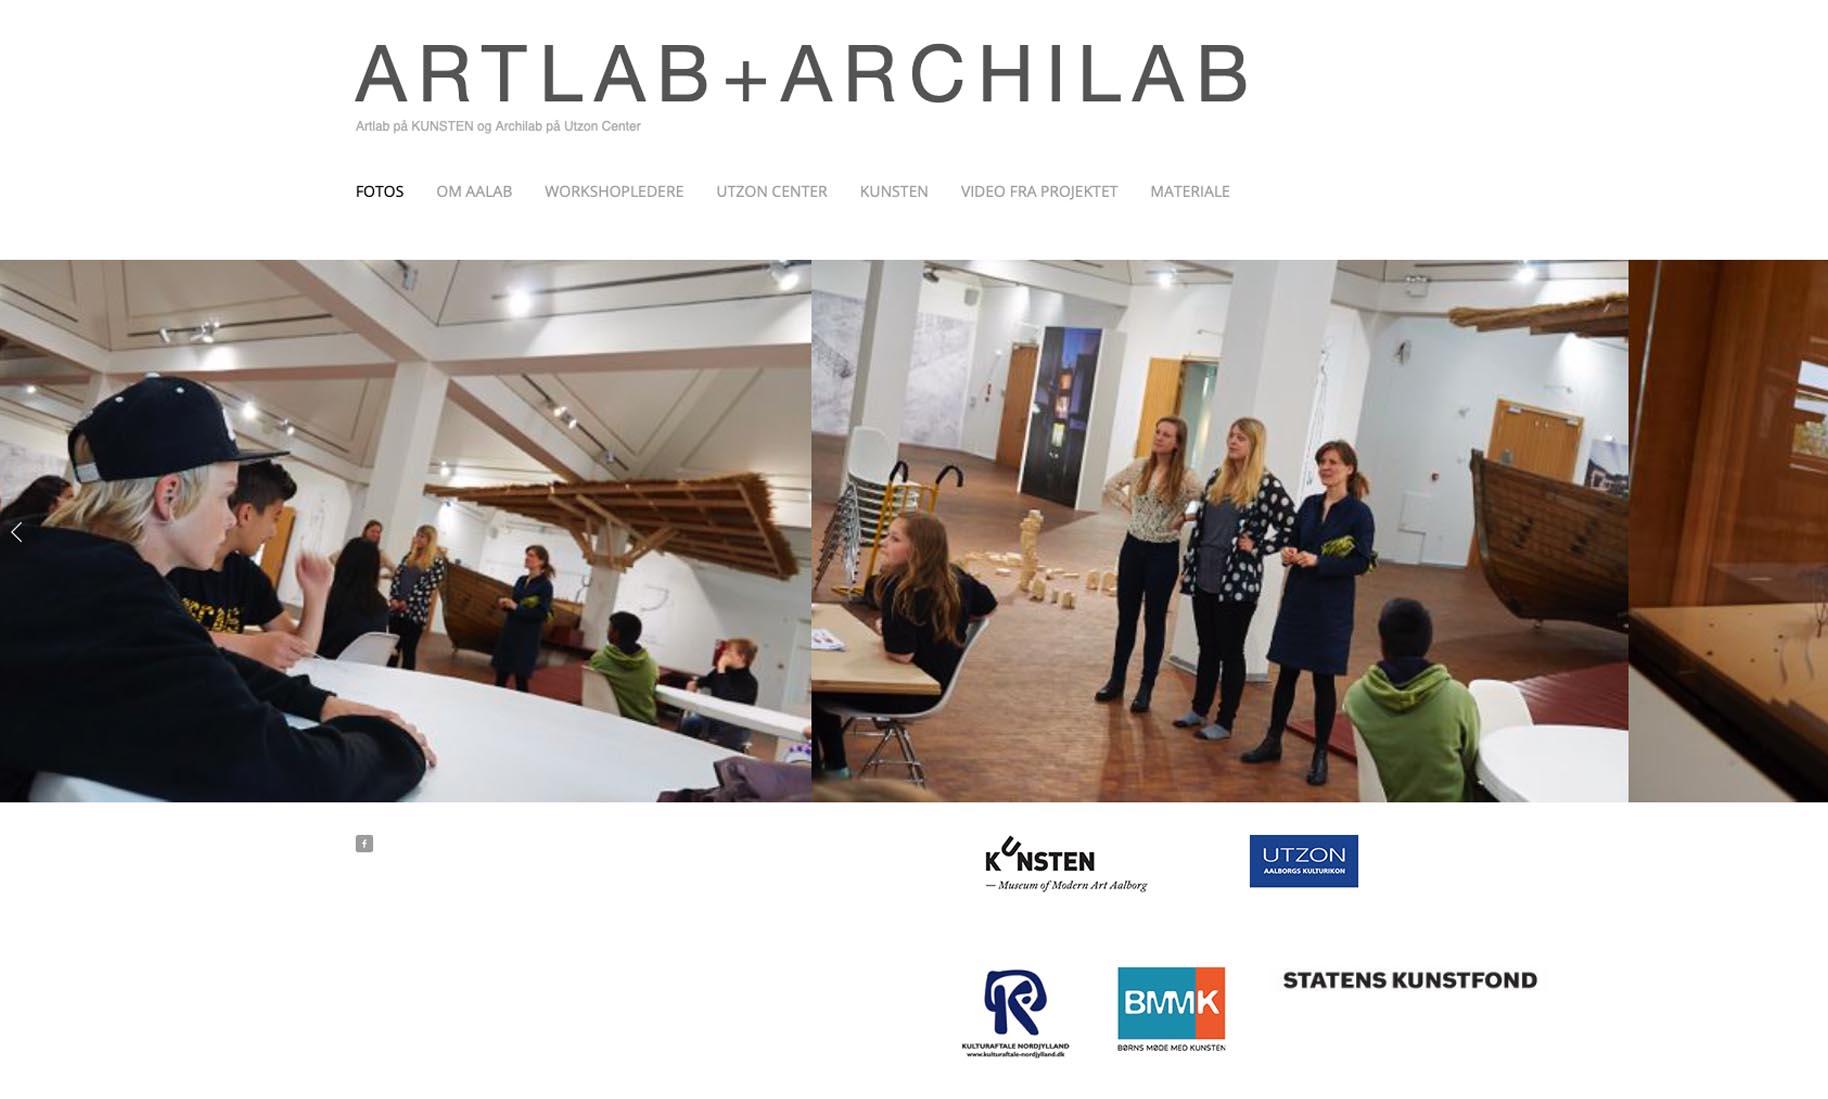 Website: ARTLAB+ARCHILAB (kunstprojekt for Region Nordjylland)